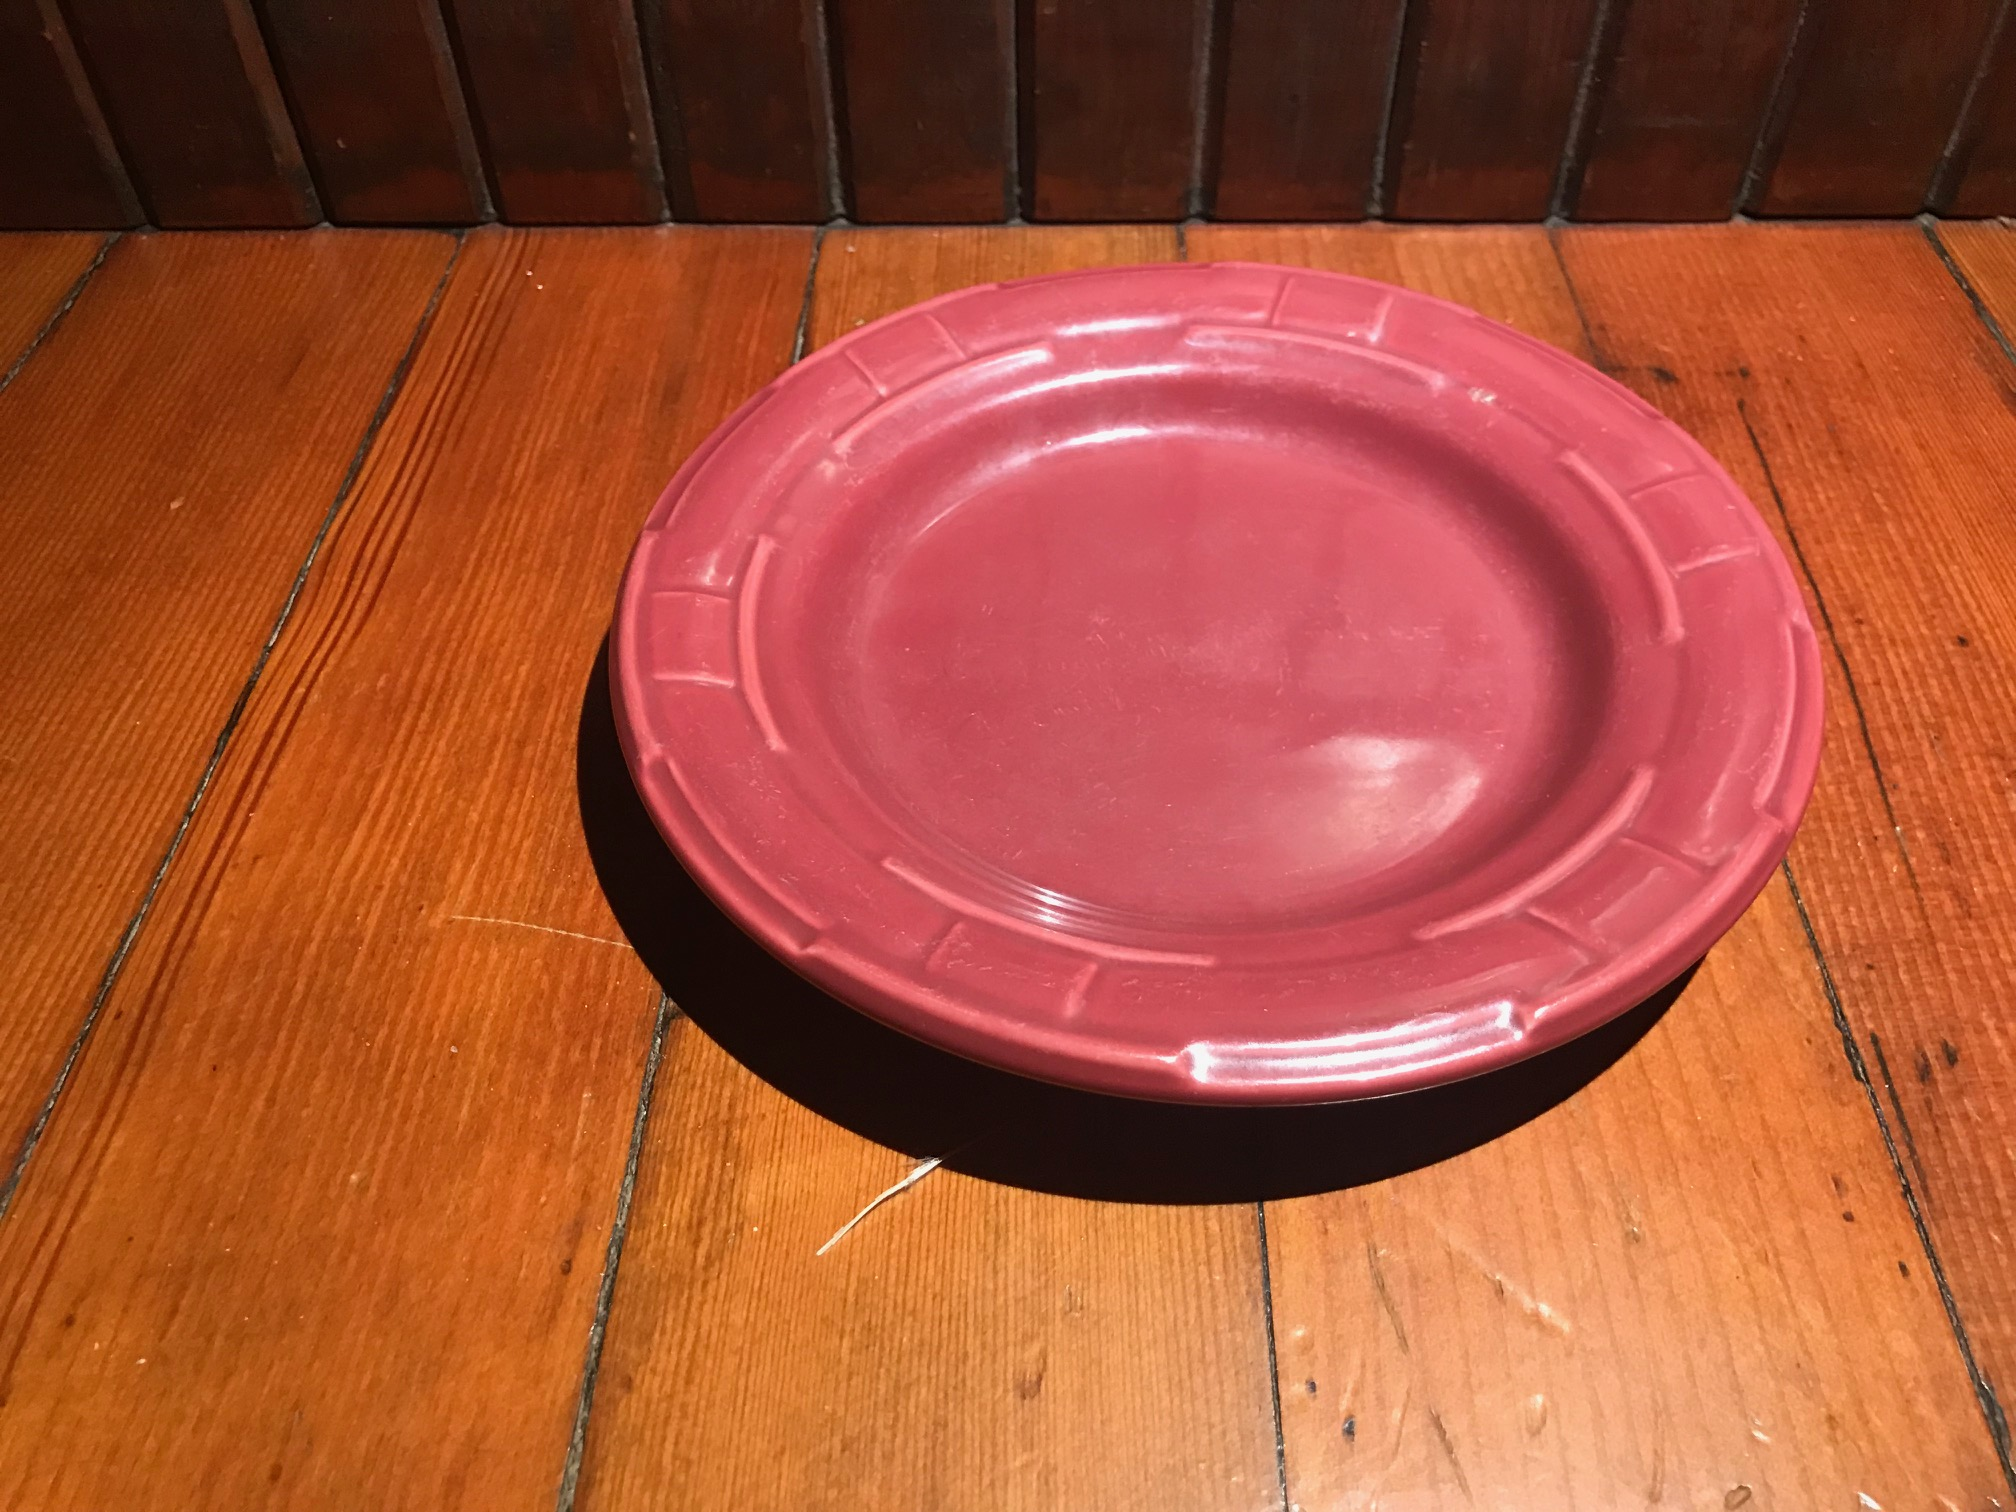 Longaberger Pottery Vitrified China Small Burgundy Plate: 56 ppm Lead + 101 ppm Cadmium